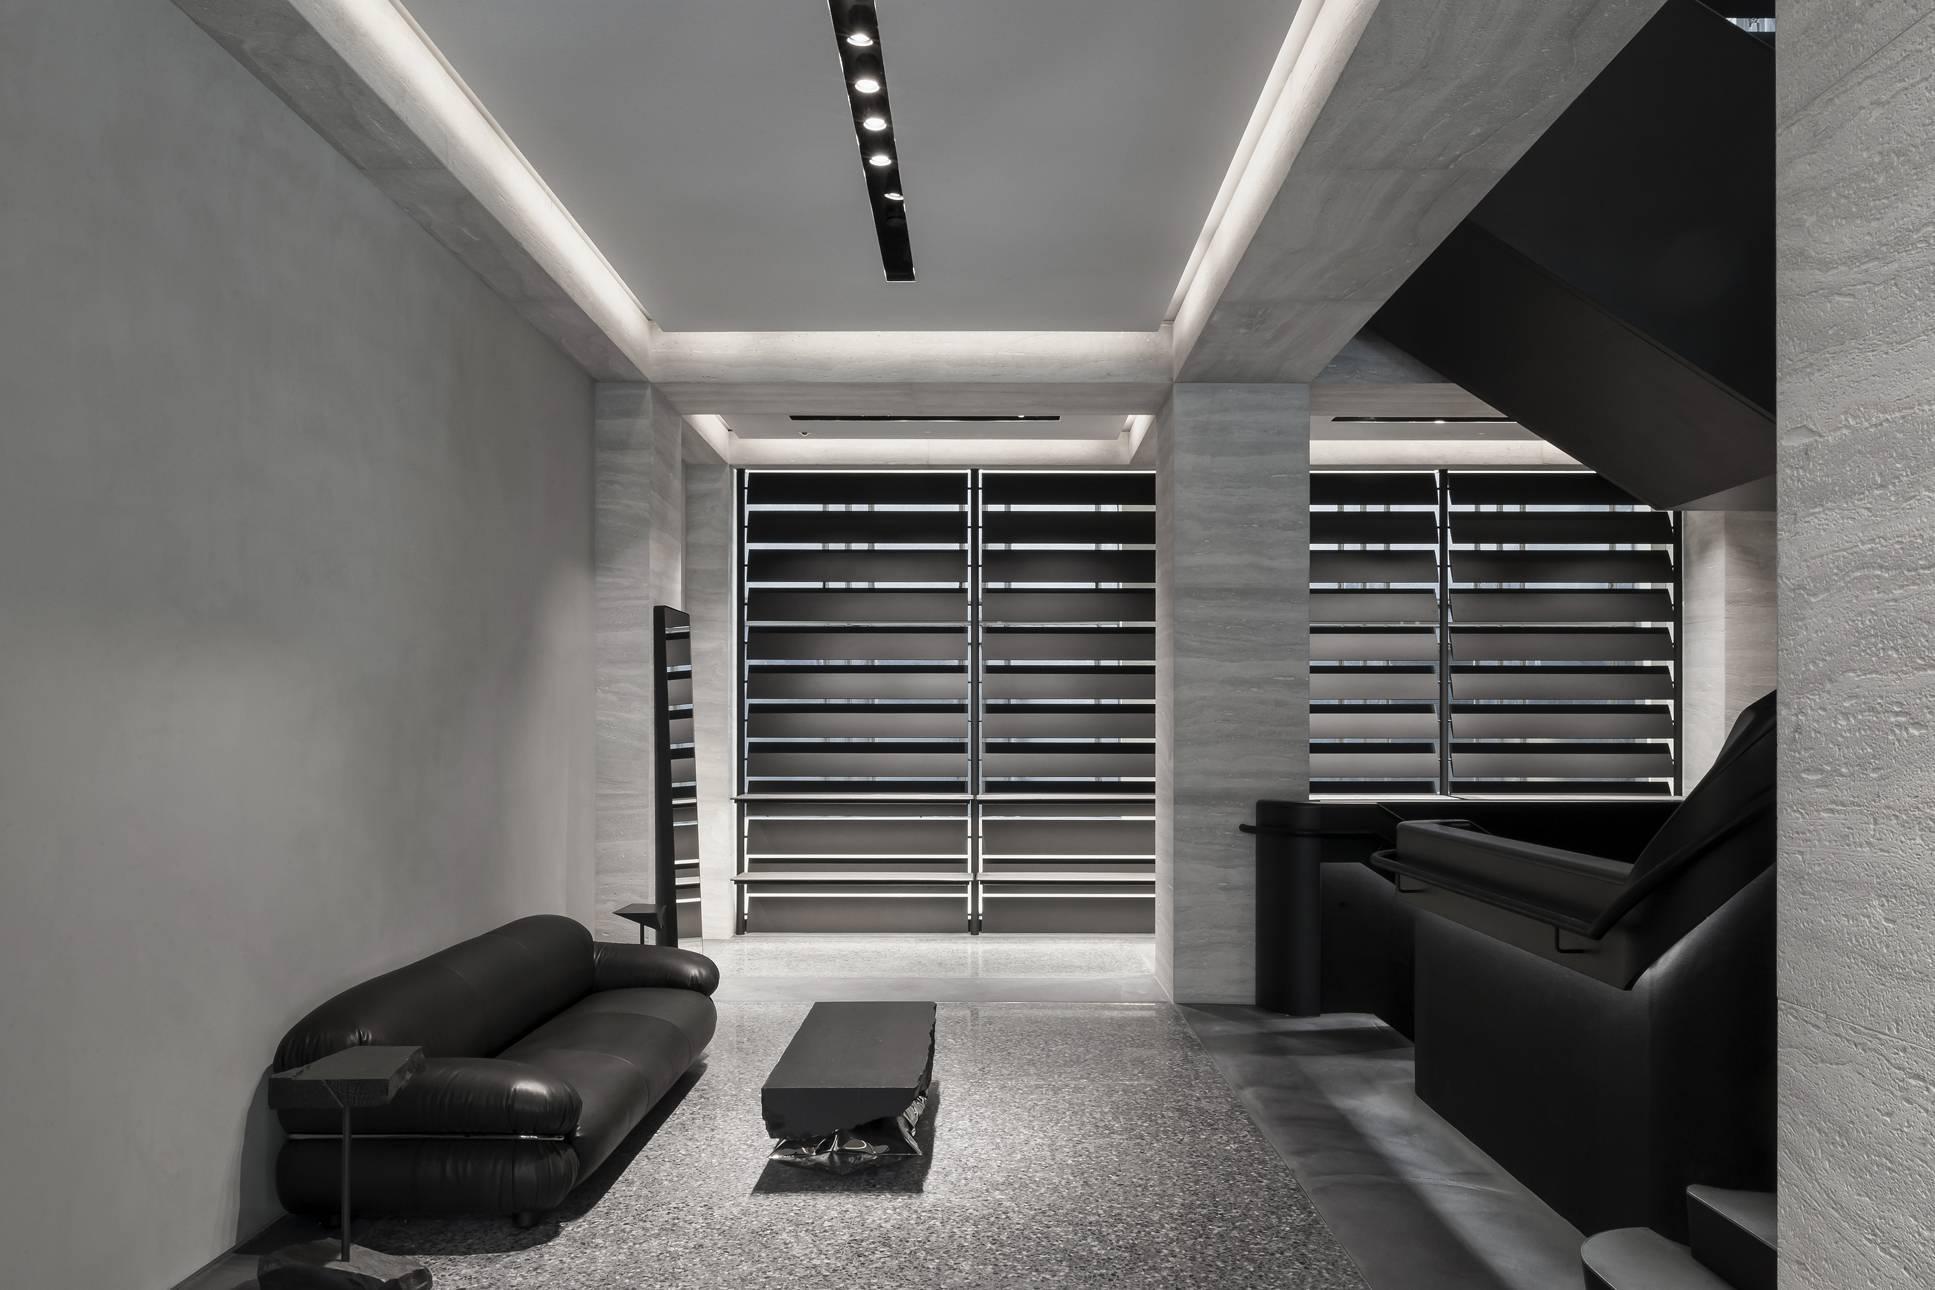 Alexander Wang Flagship Store_Vincent Van Duysen Architects_05.jpg